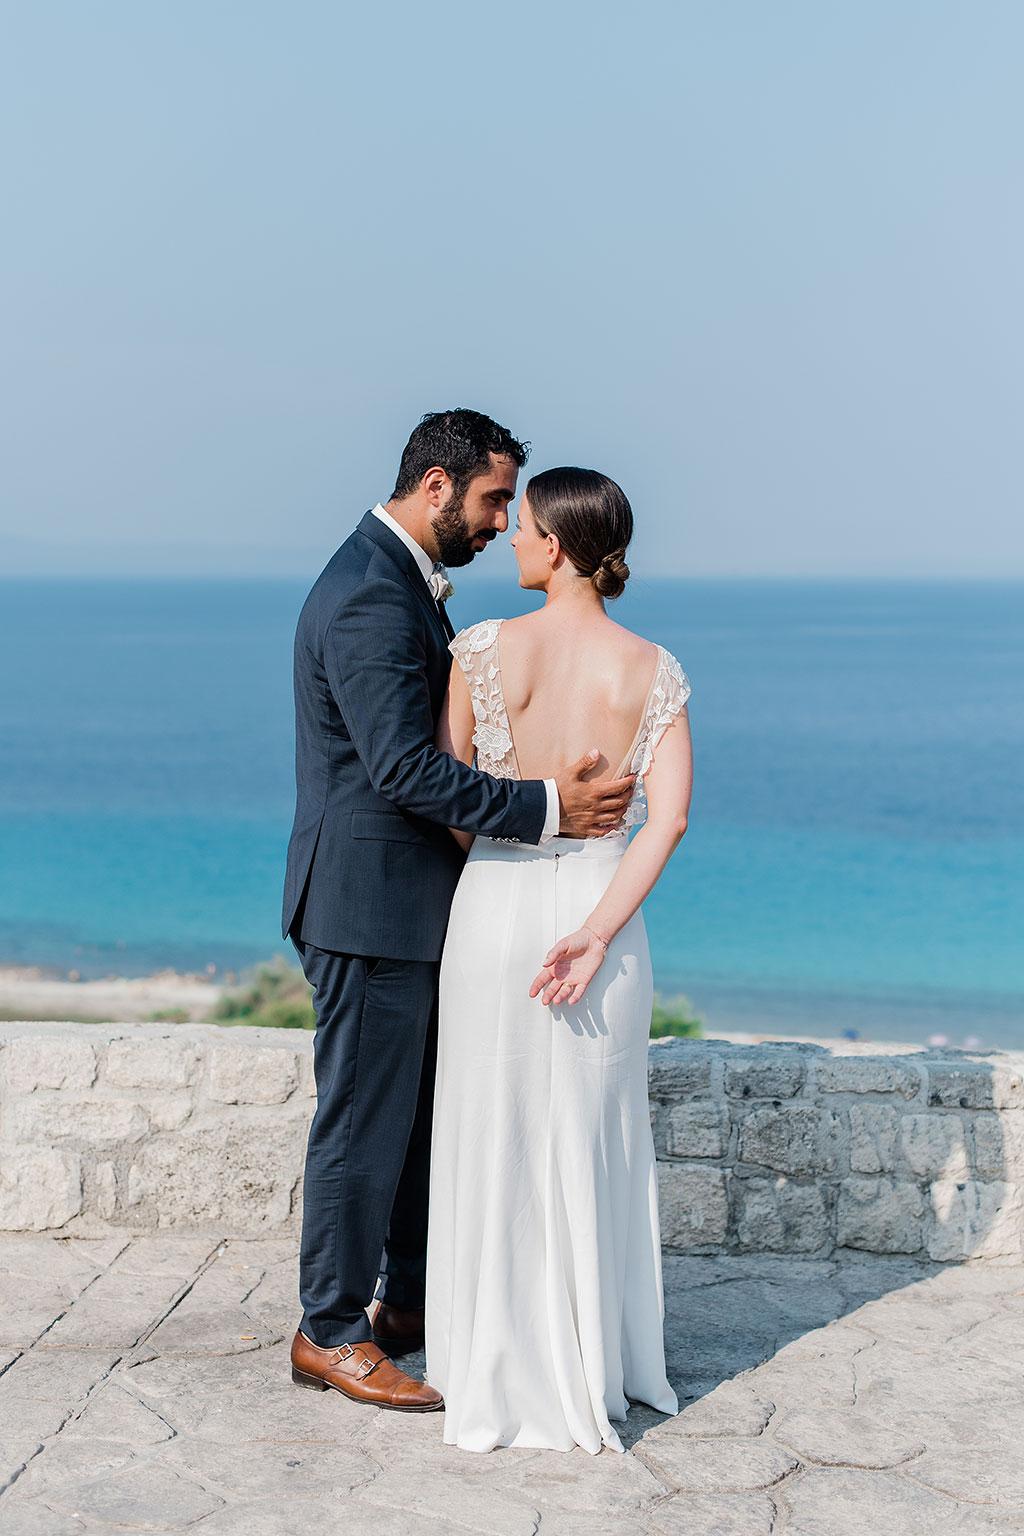 wedding in chalkidiki, Φωτογράφος γάμου Χαλκιδική,